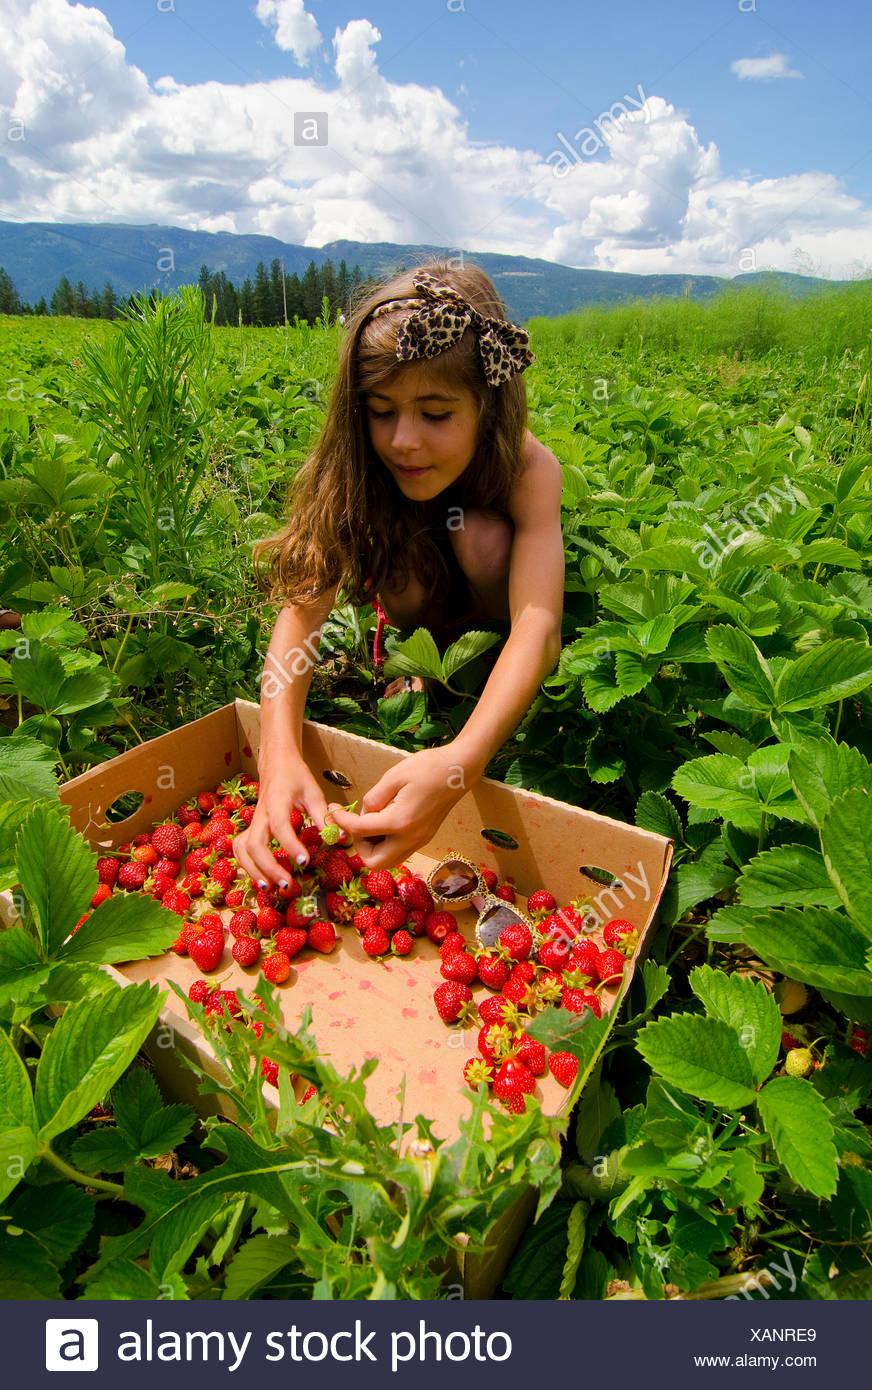 Young girl picks strawberries at Okanagan Asparagus Farm in Armstrong in Okanagan region of British Columbia Canada MR022. - Stock Image